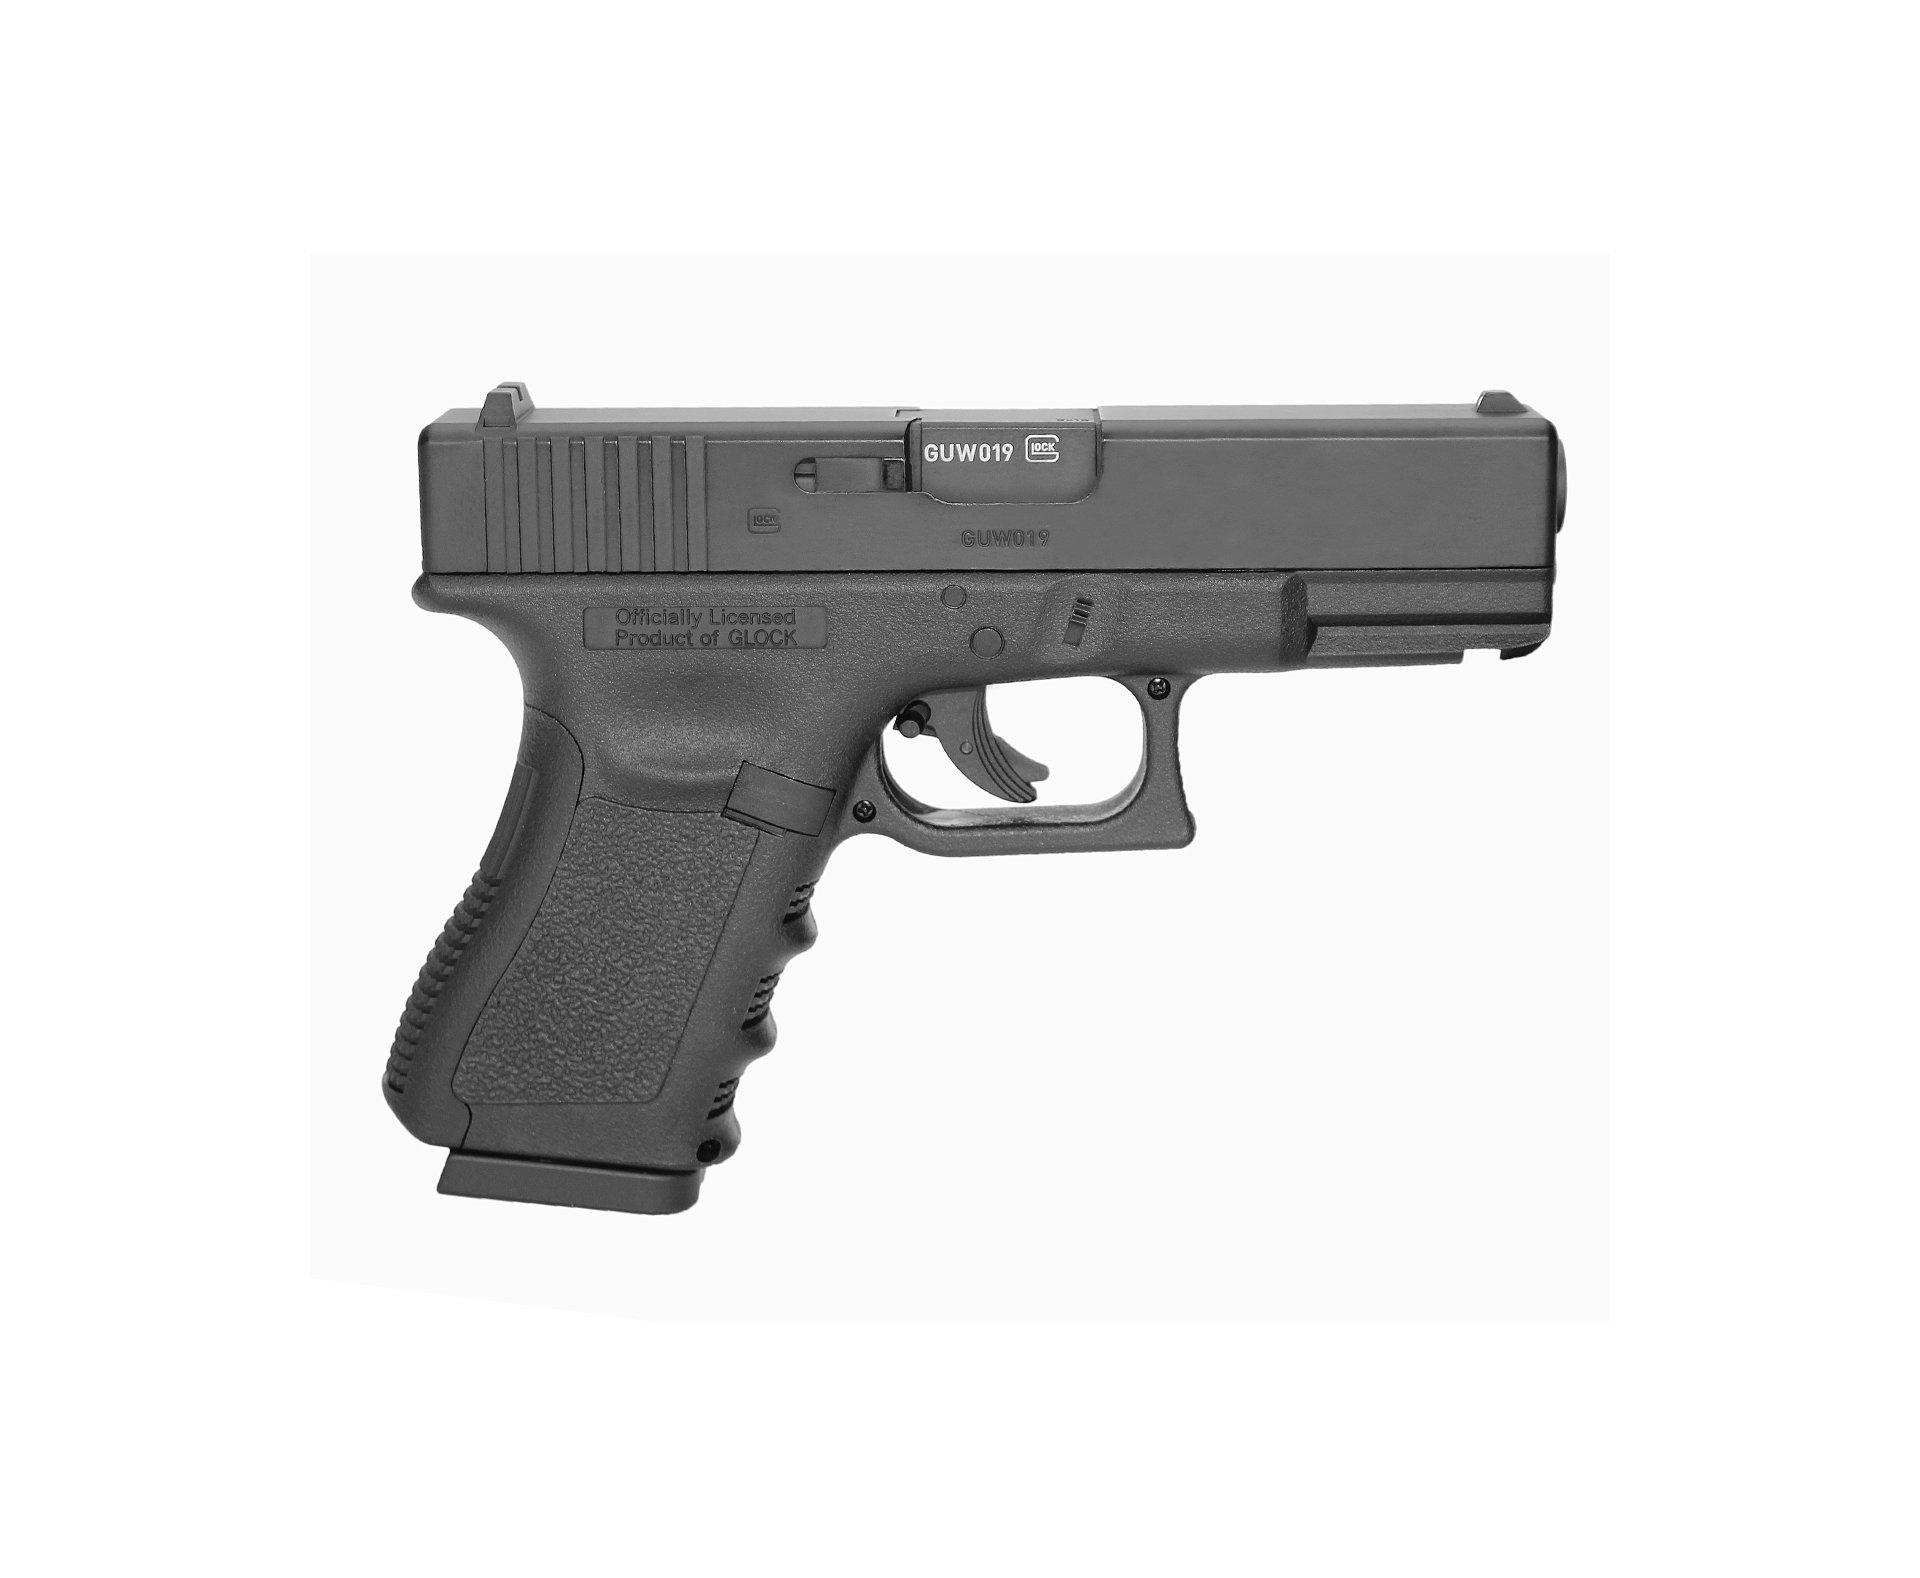 Pistola De Pressão Co2 Glock G19 Slide Metal 4,5mm Oficial